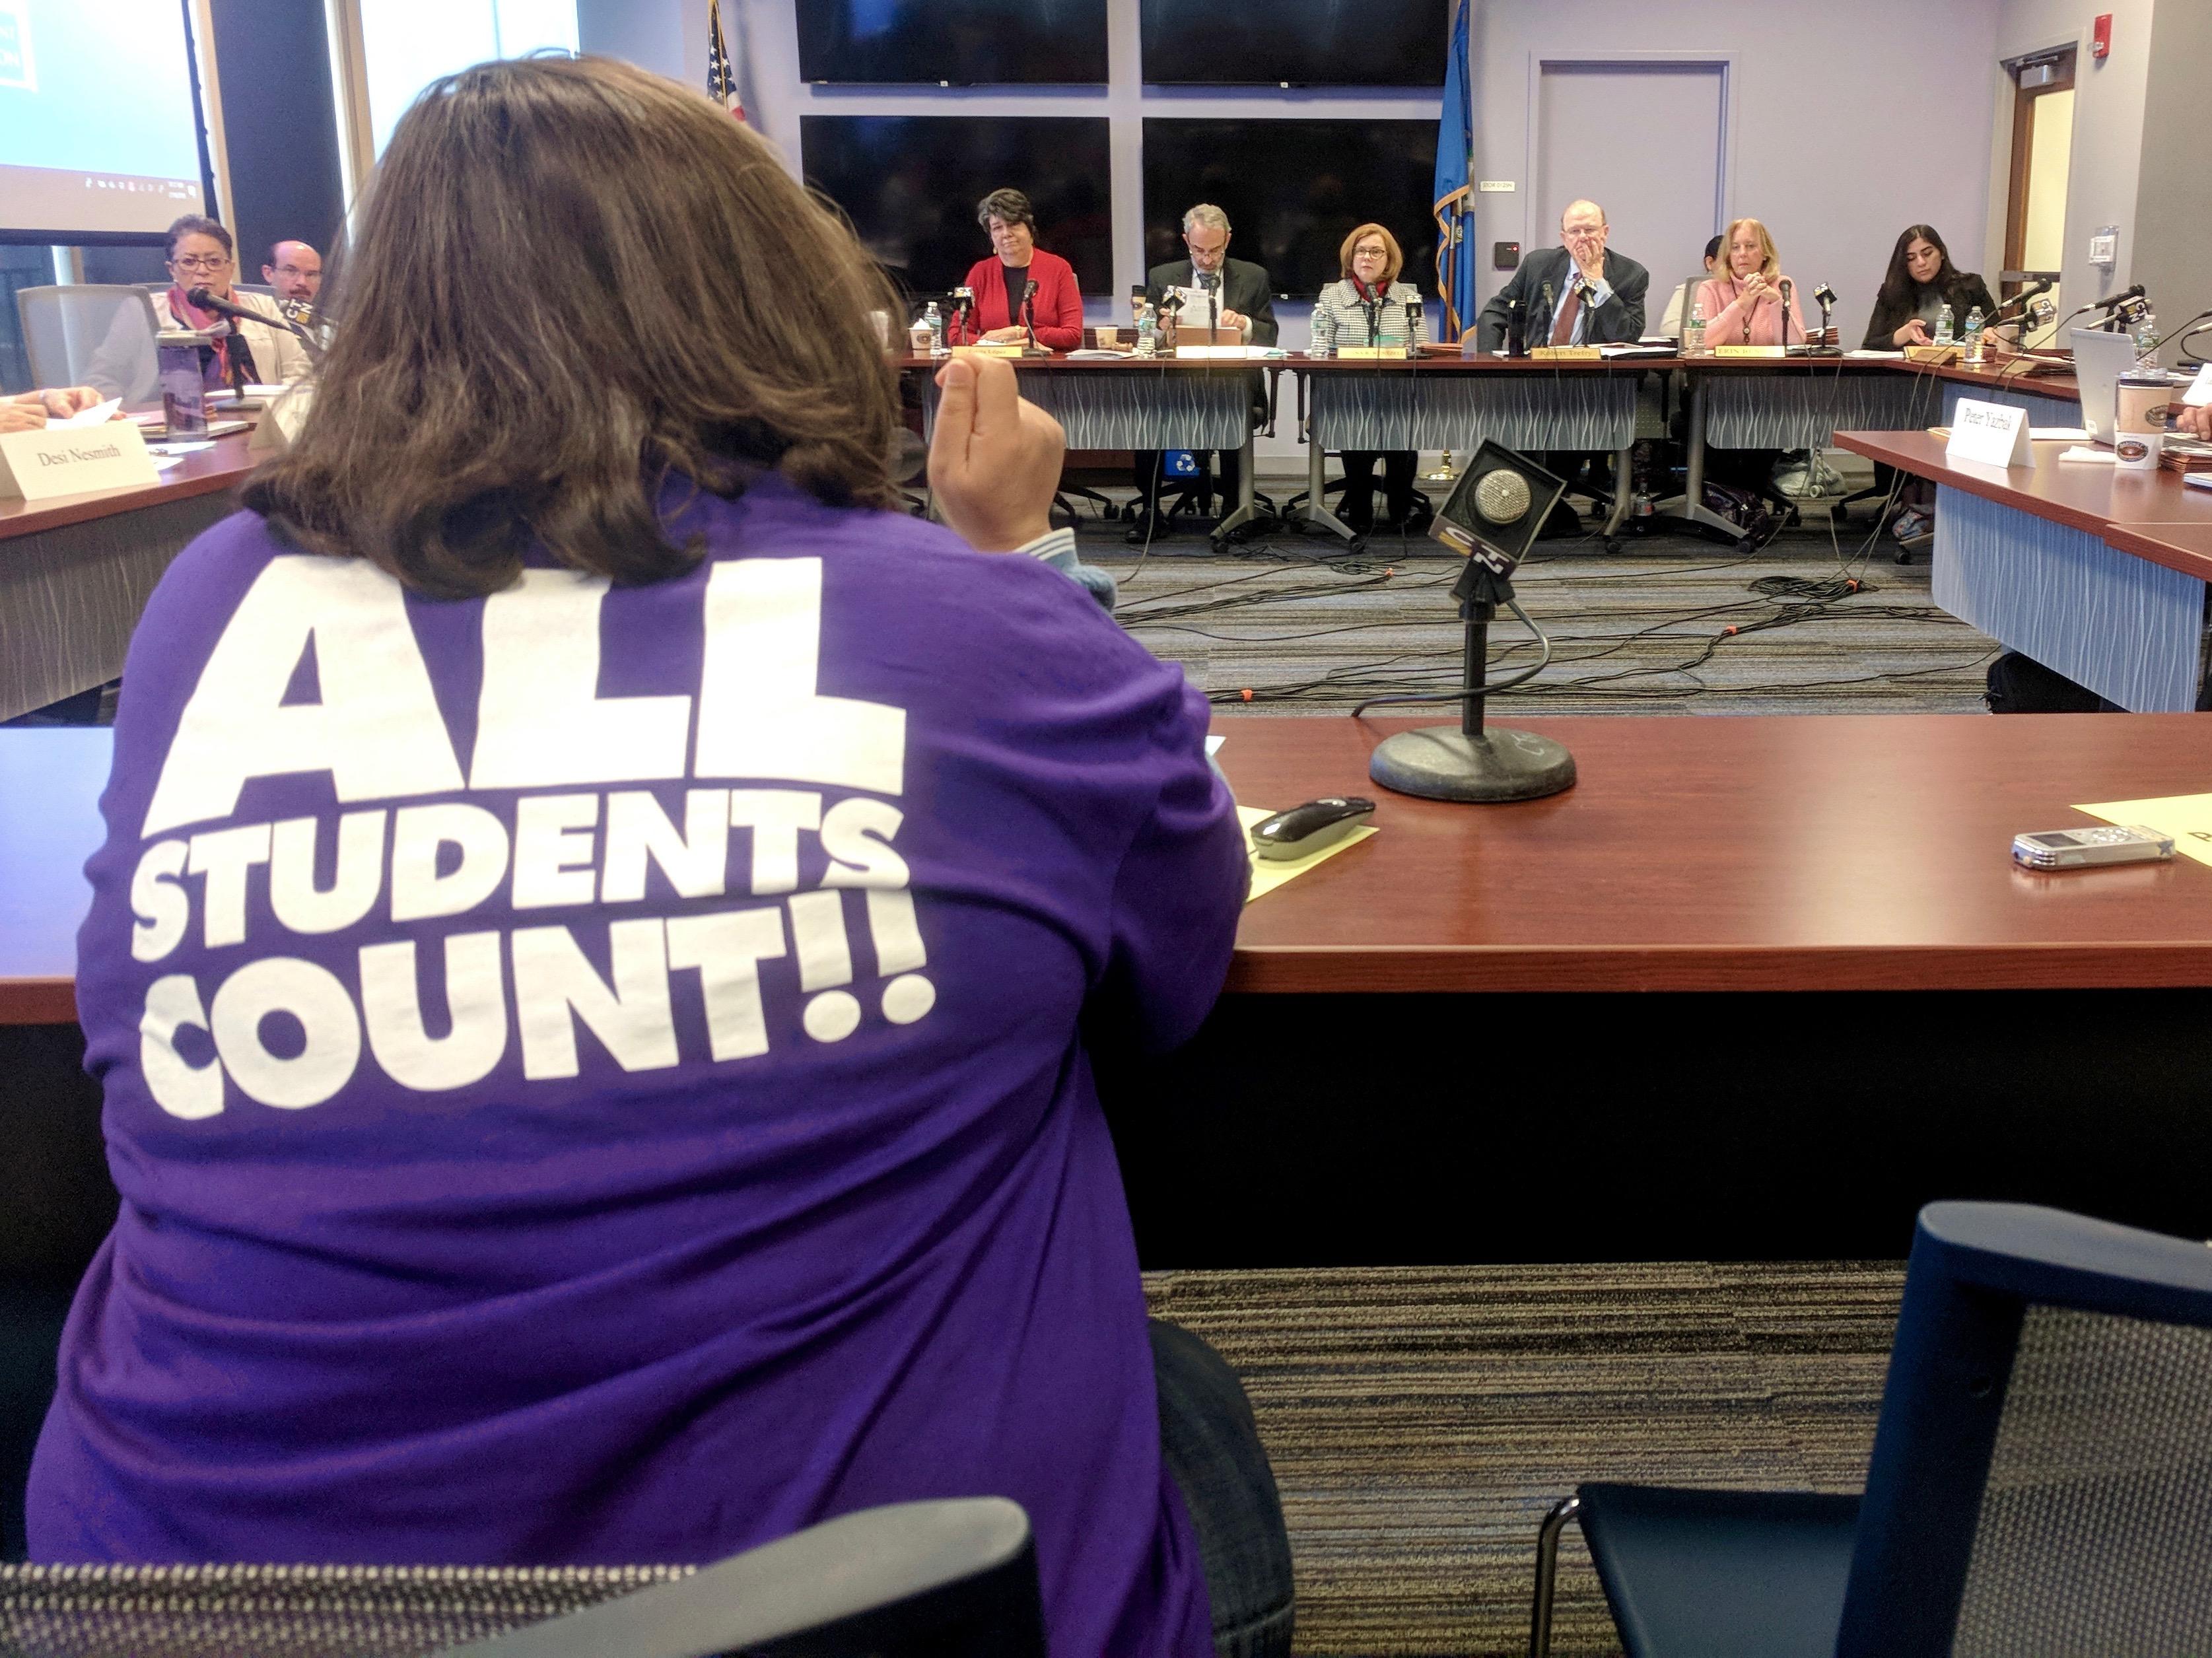 Board rejects legislature's budget for more charter school funding